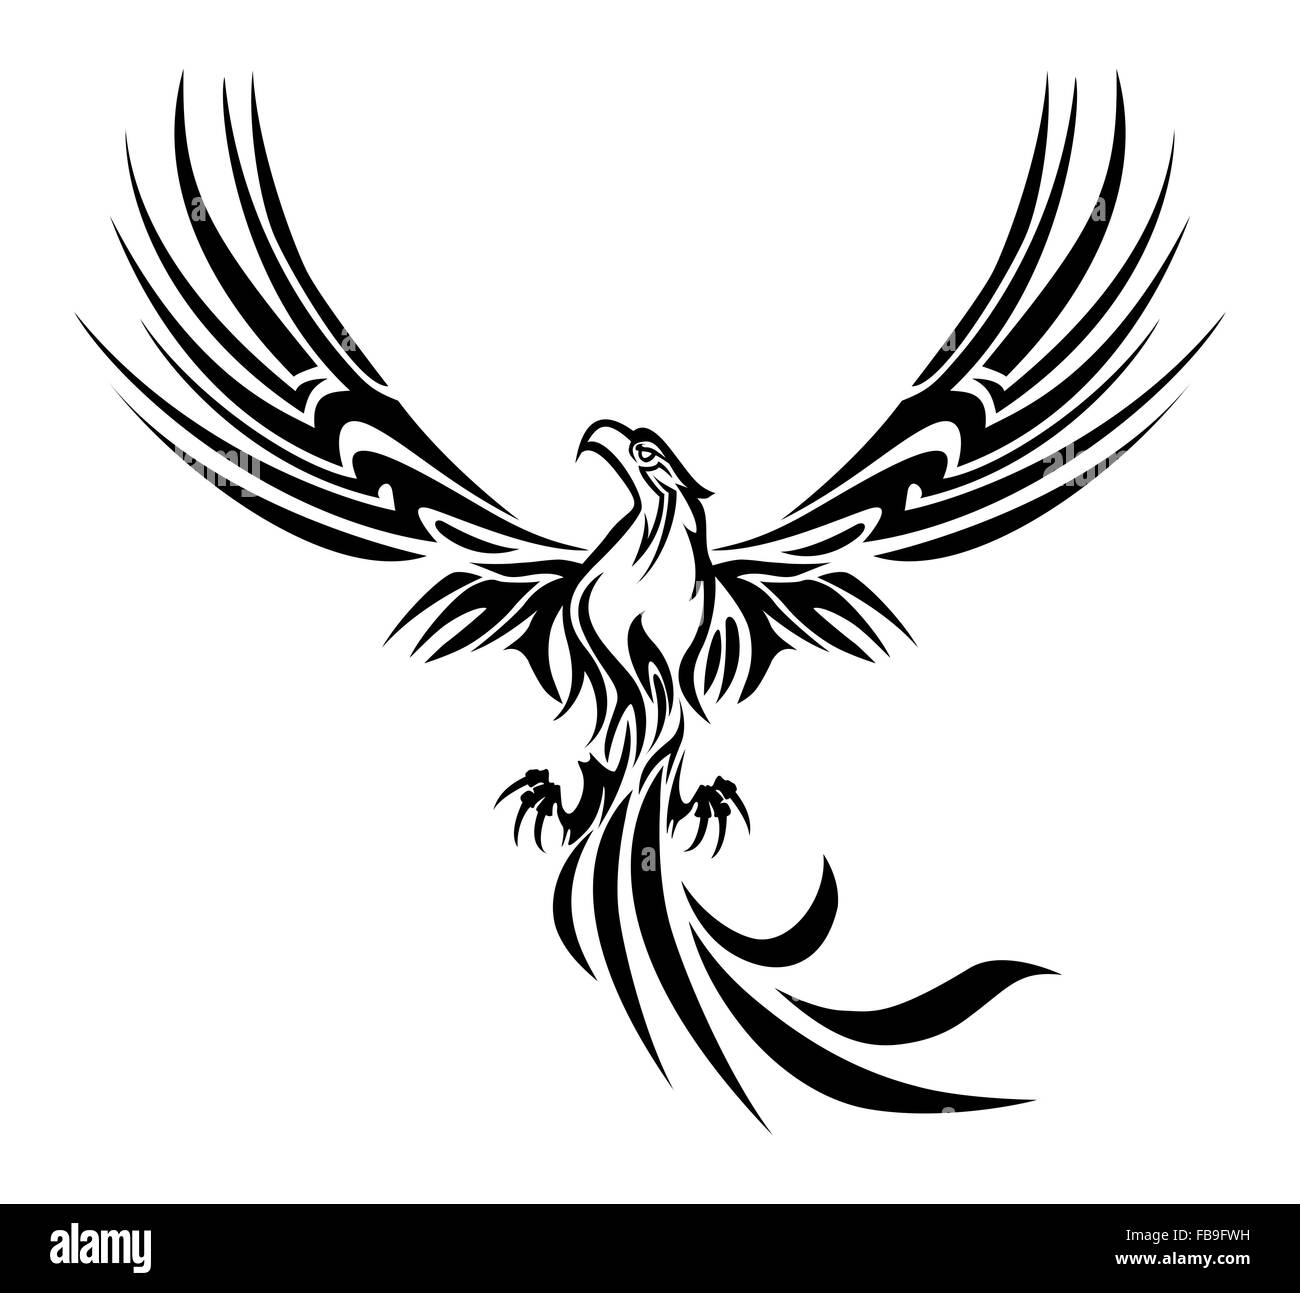 Phoenix Bird Tattoo Imágenes De Stock Phoenix Bird Tattoo Fotos De